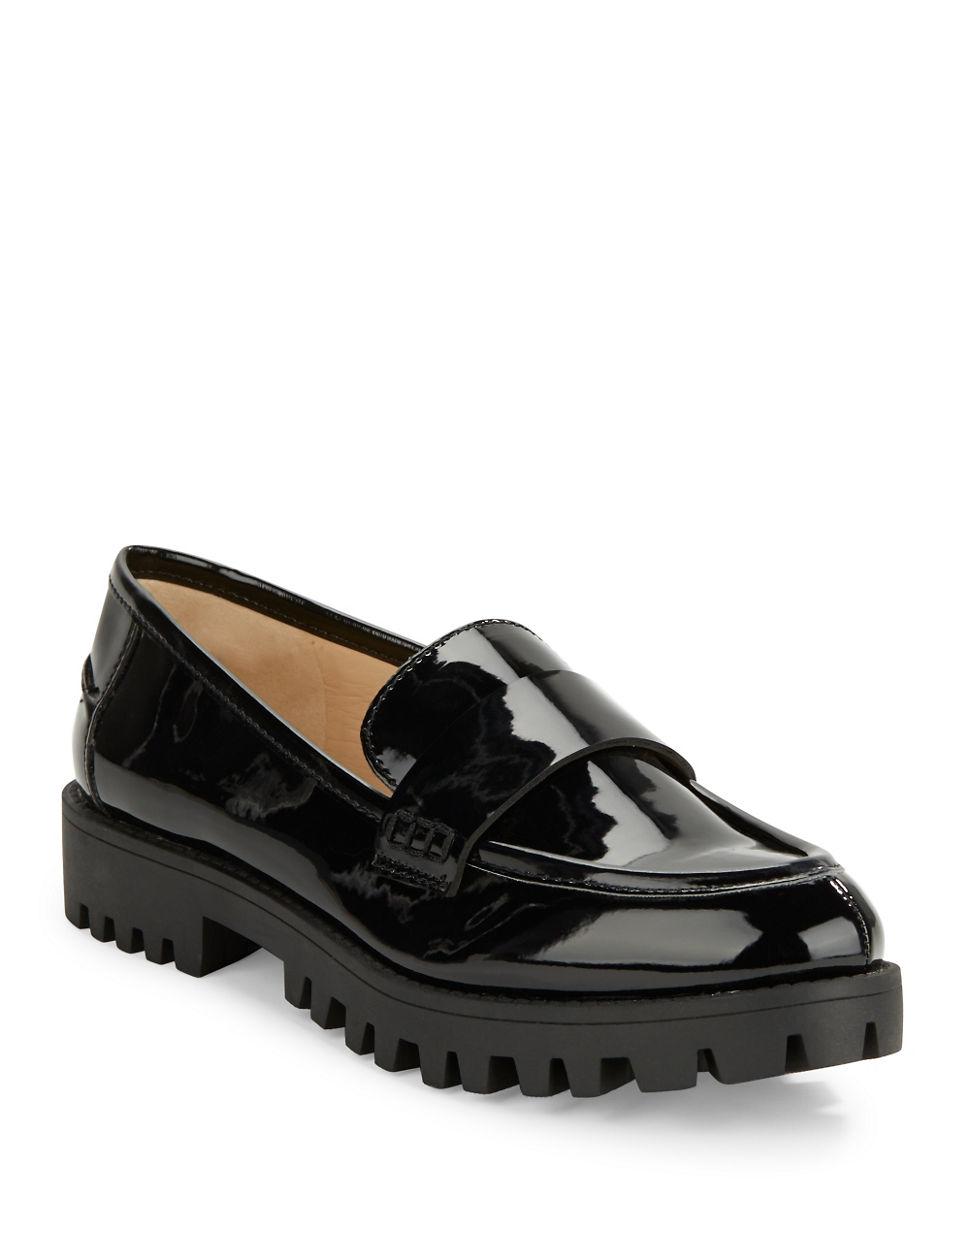 Nine west Juniper Point Toe Loafers in Black